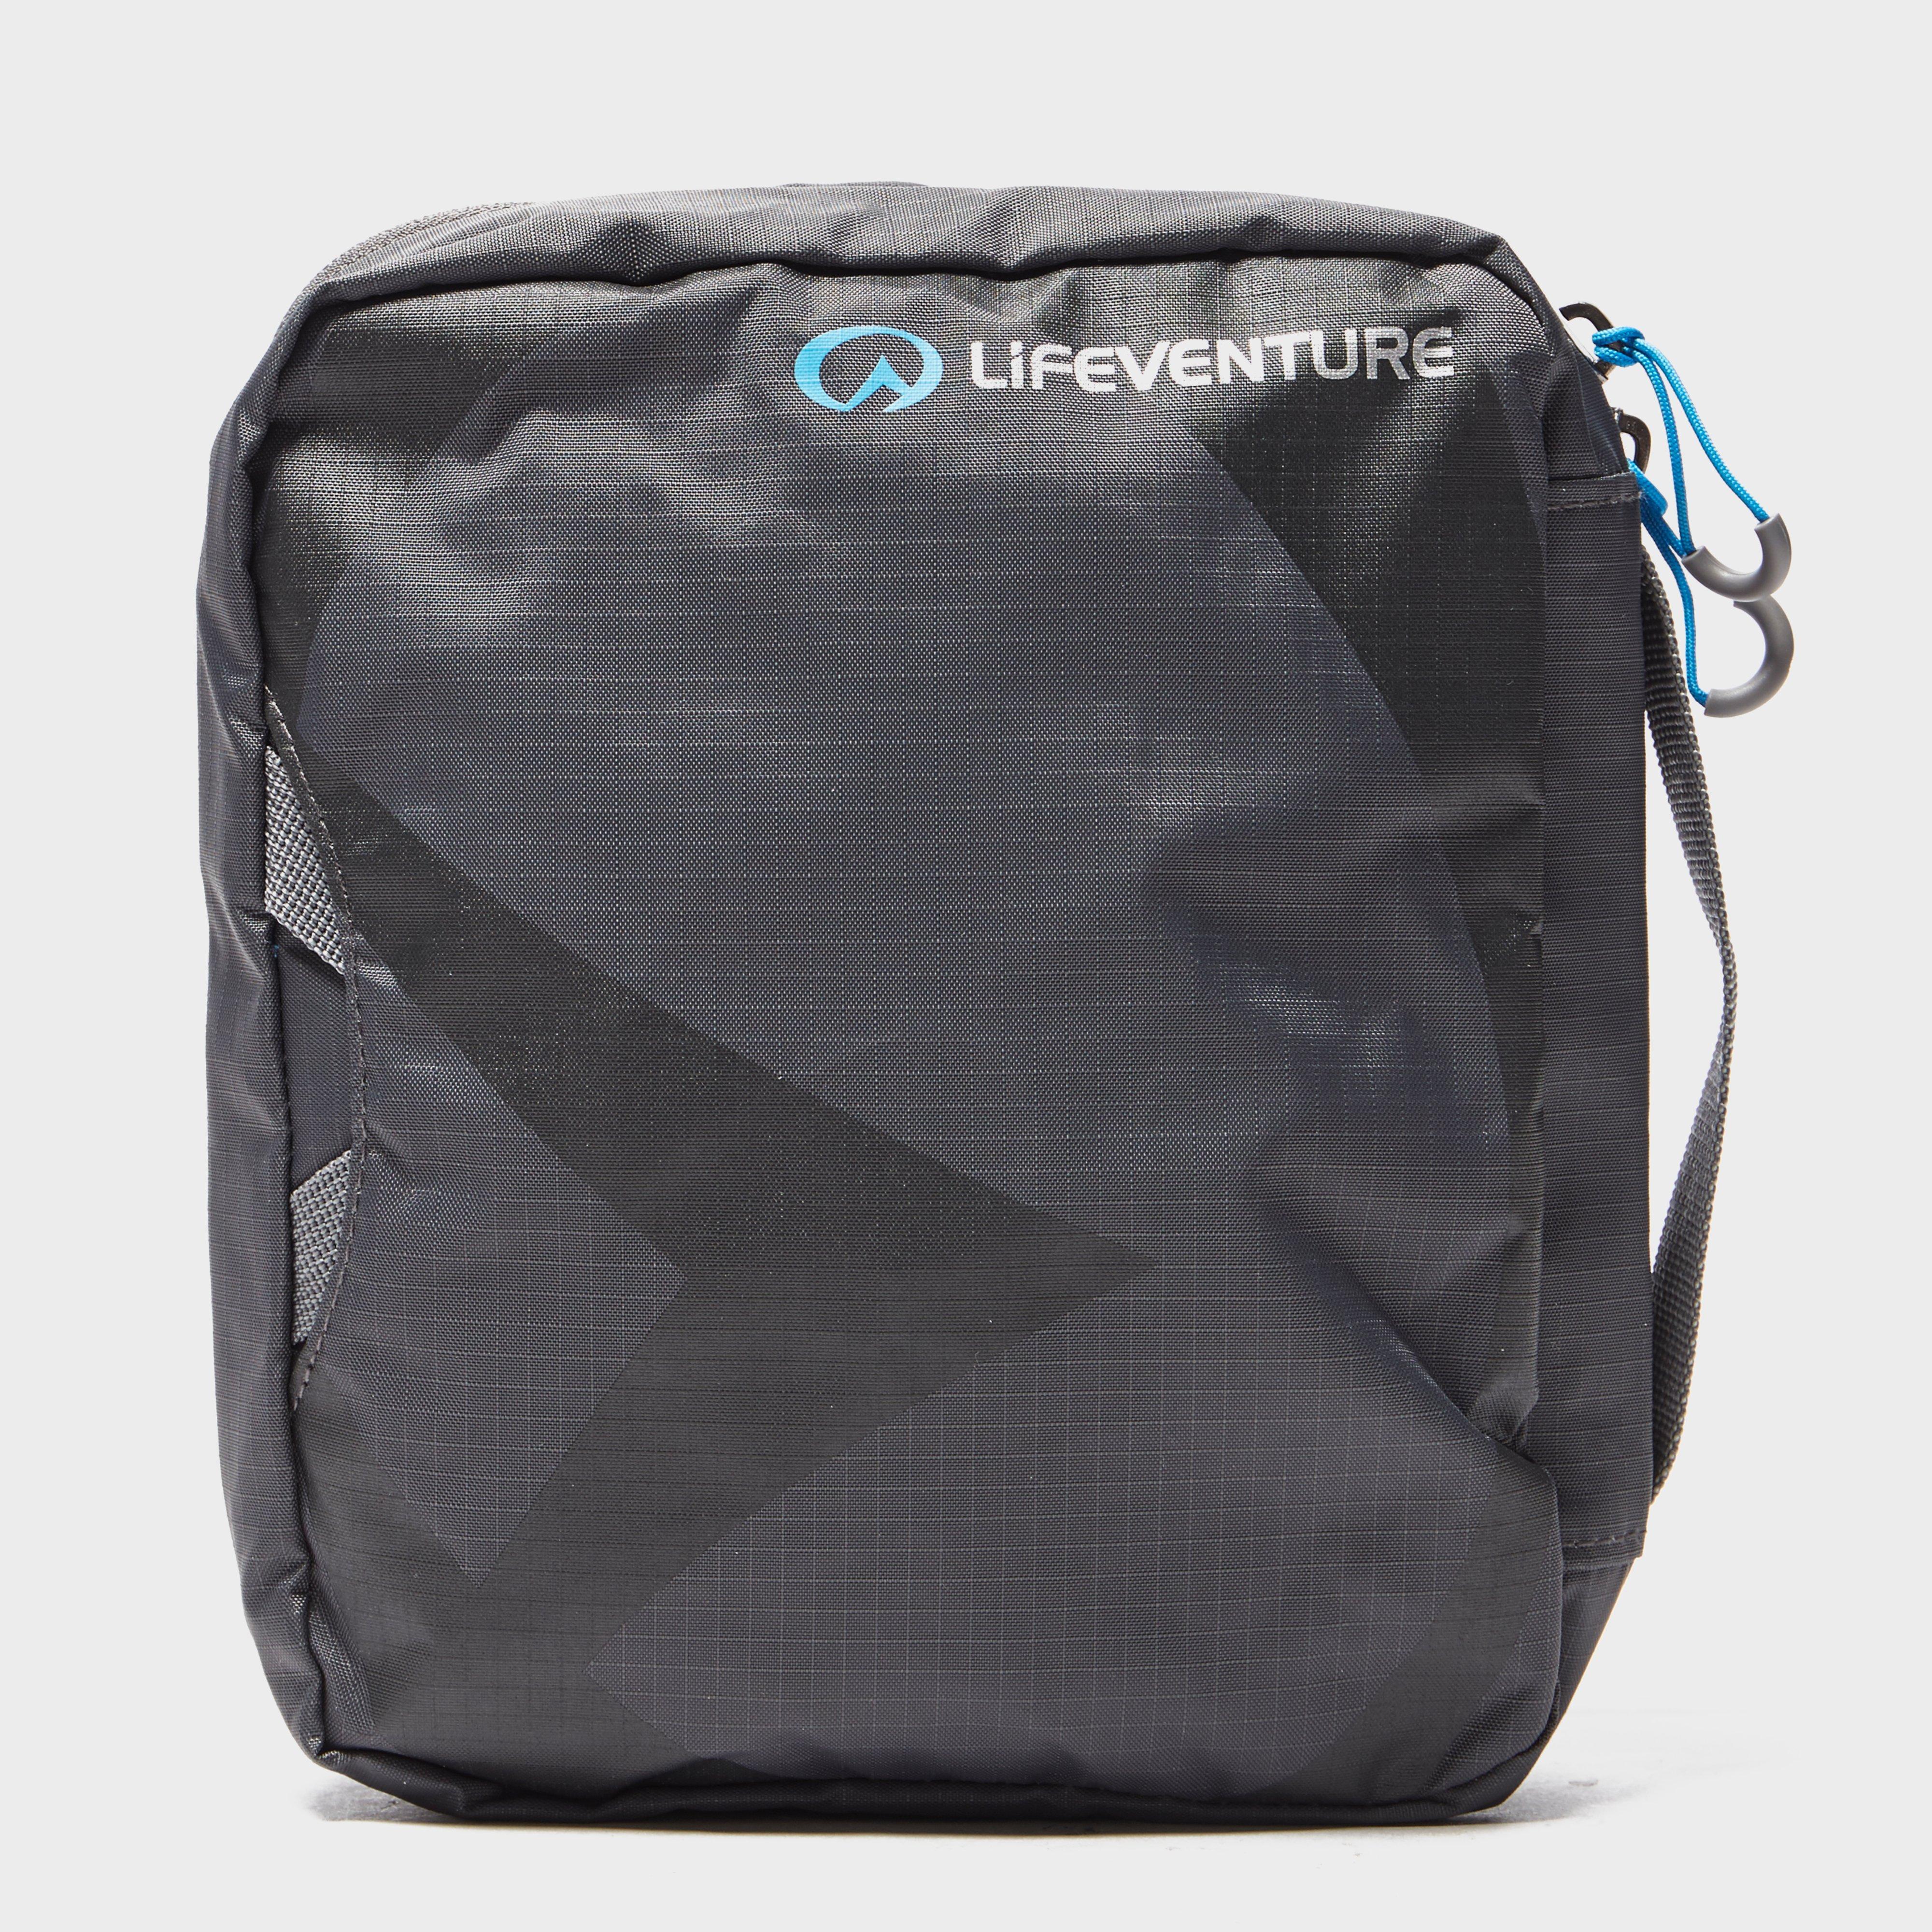 Lifeventure Travel Wash Bag (Large), Dark Grey